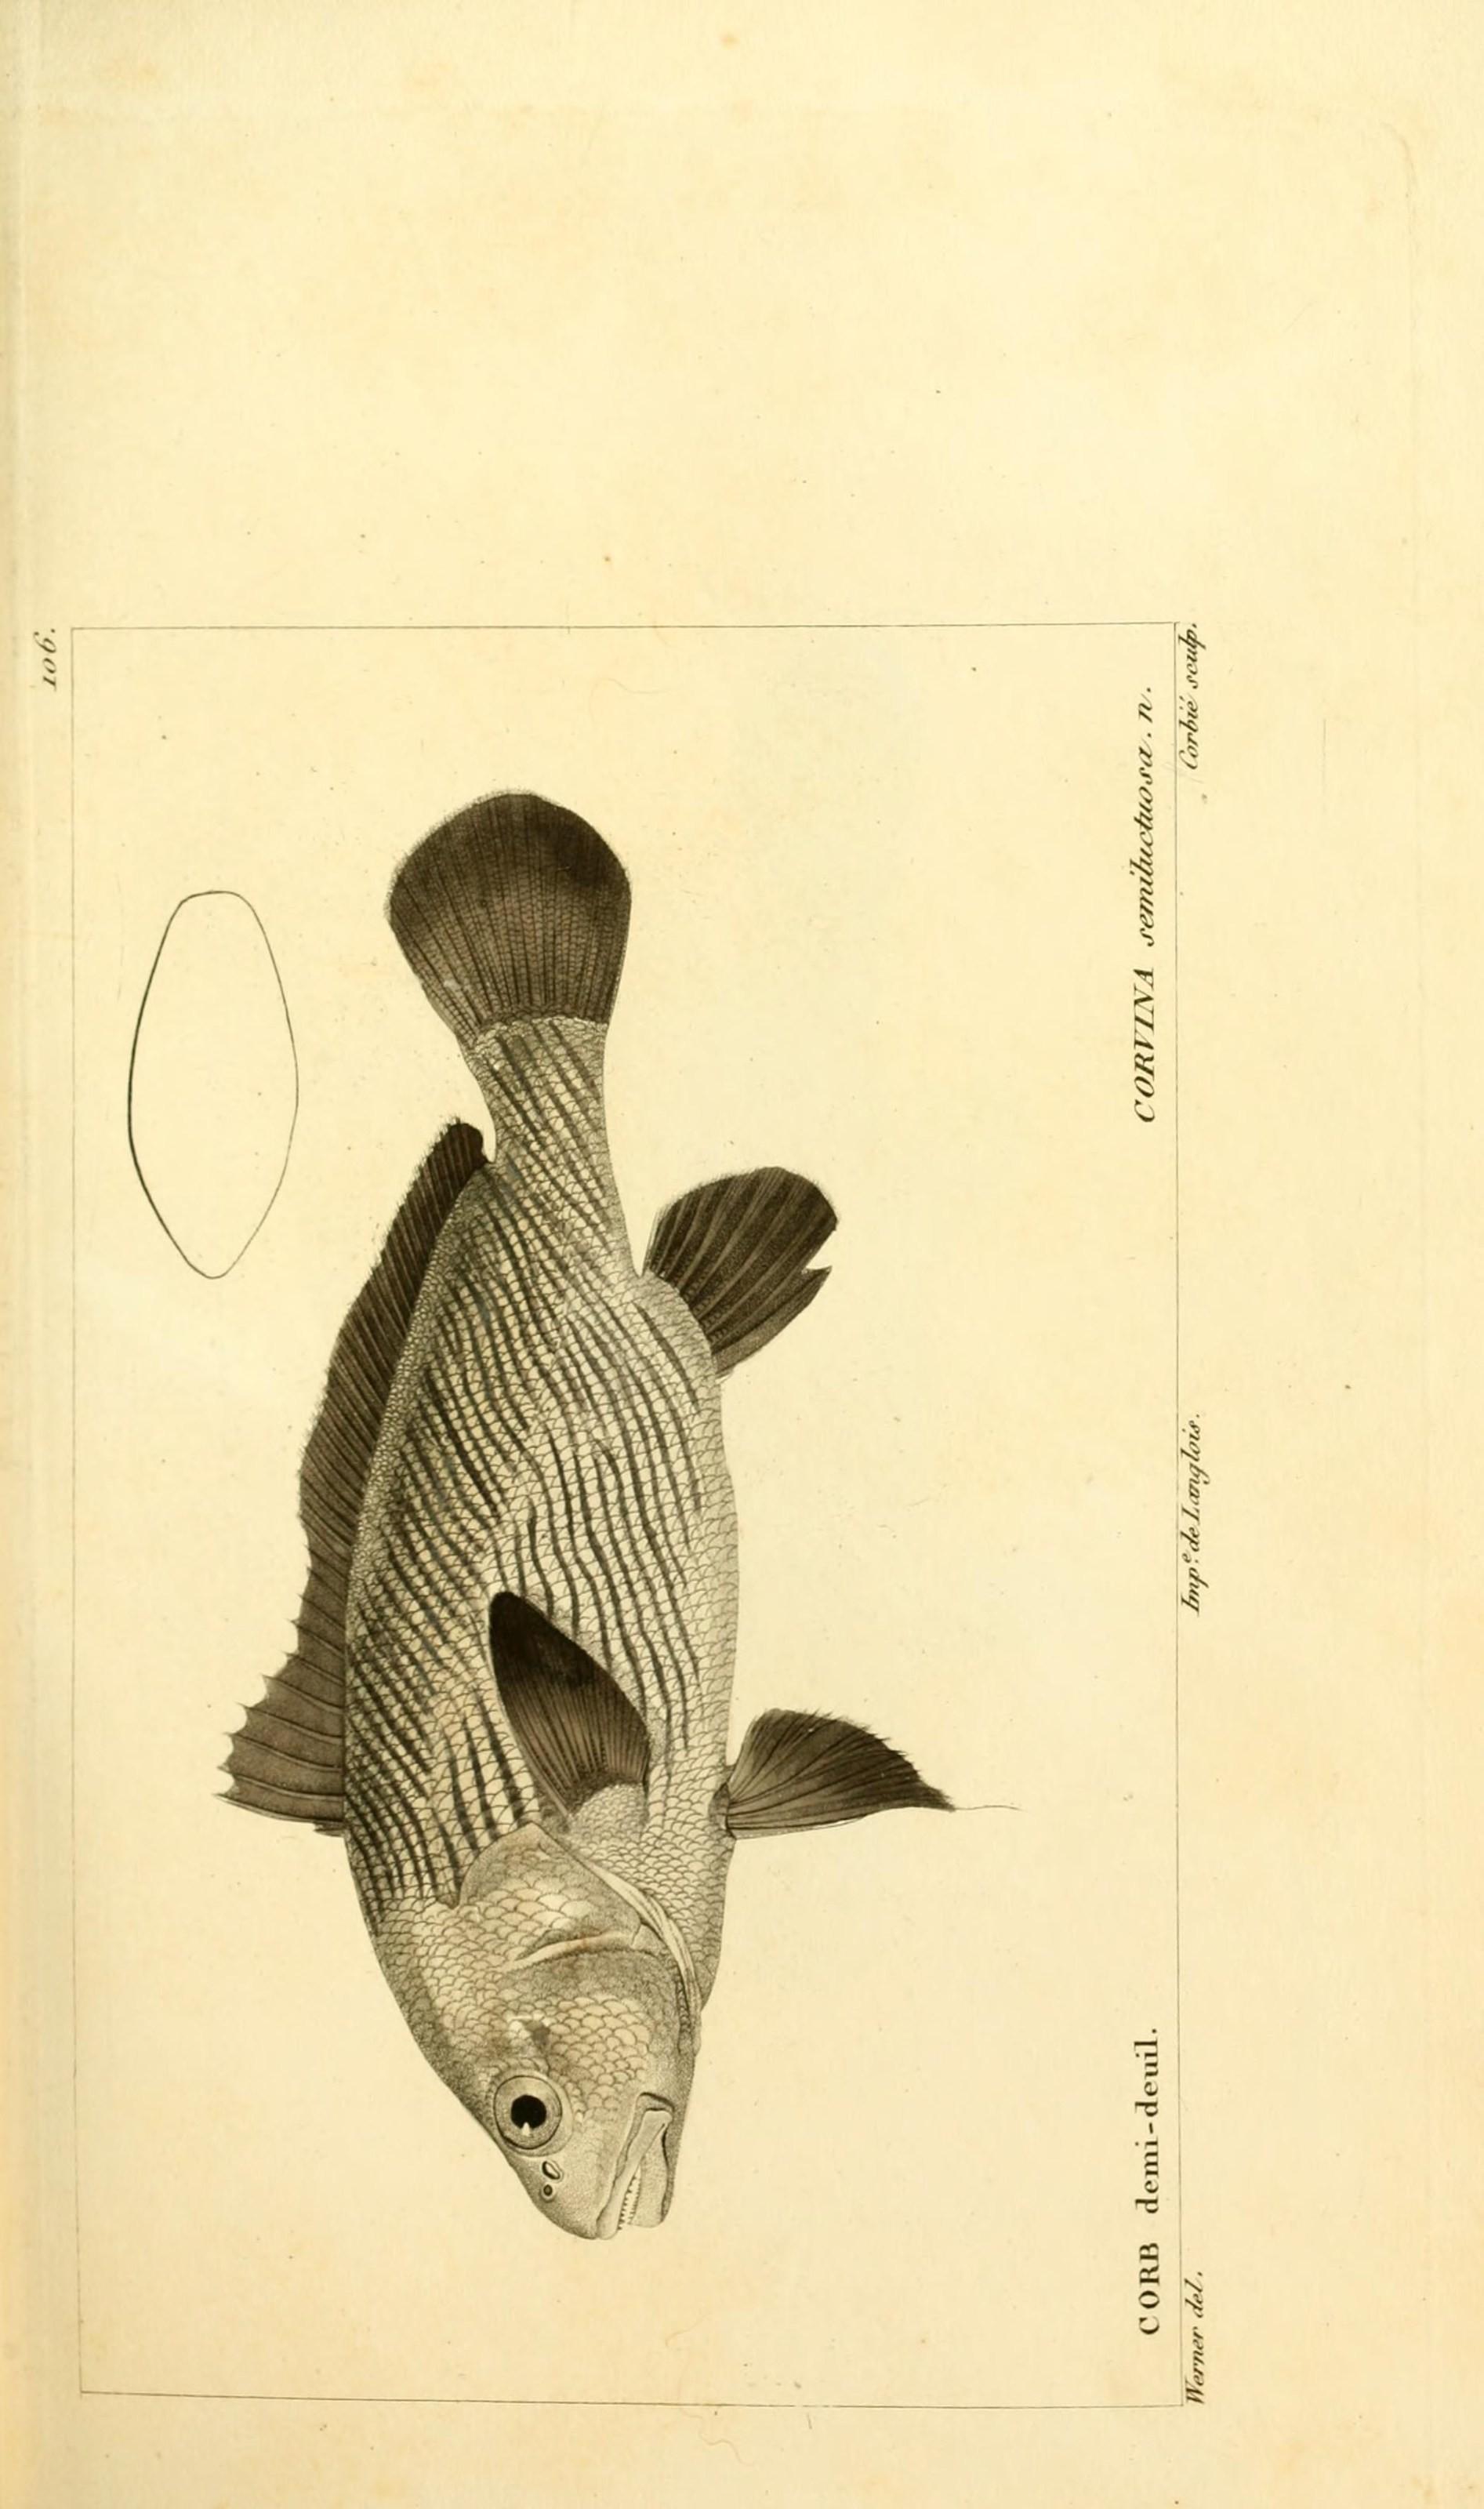 Image of Croaker